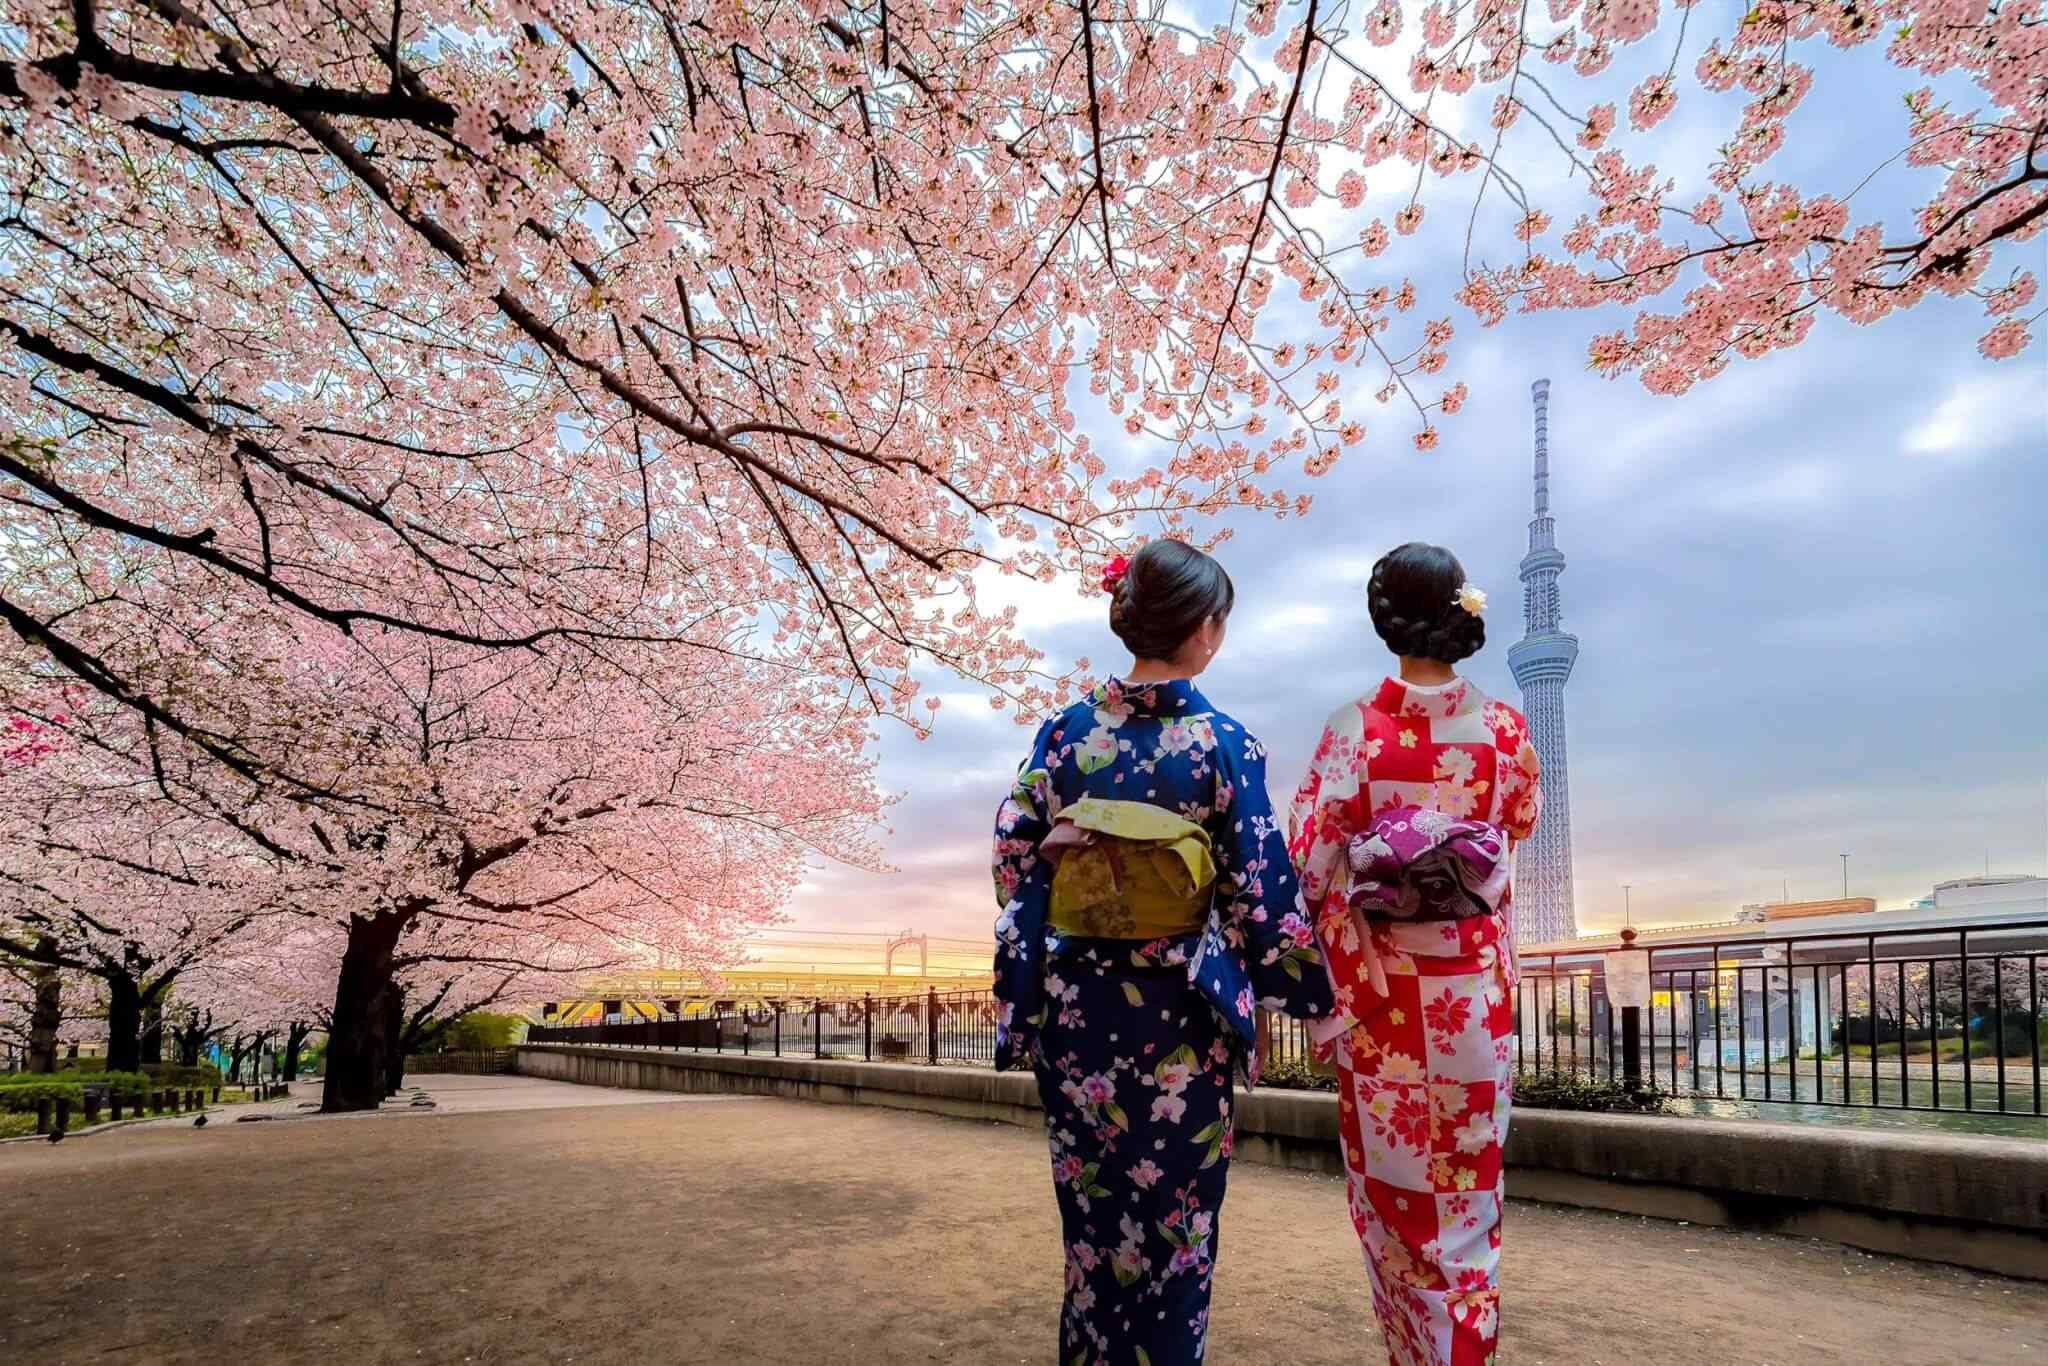 https://www.banitours.com/wp-content/uploads/2018/09/destination-tokyo-03.jpg